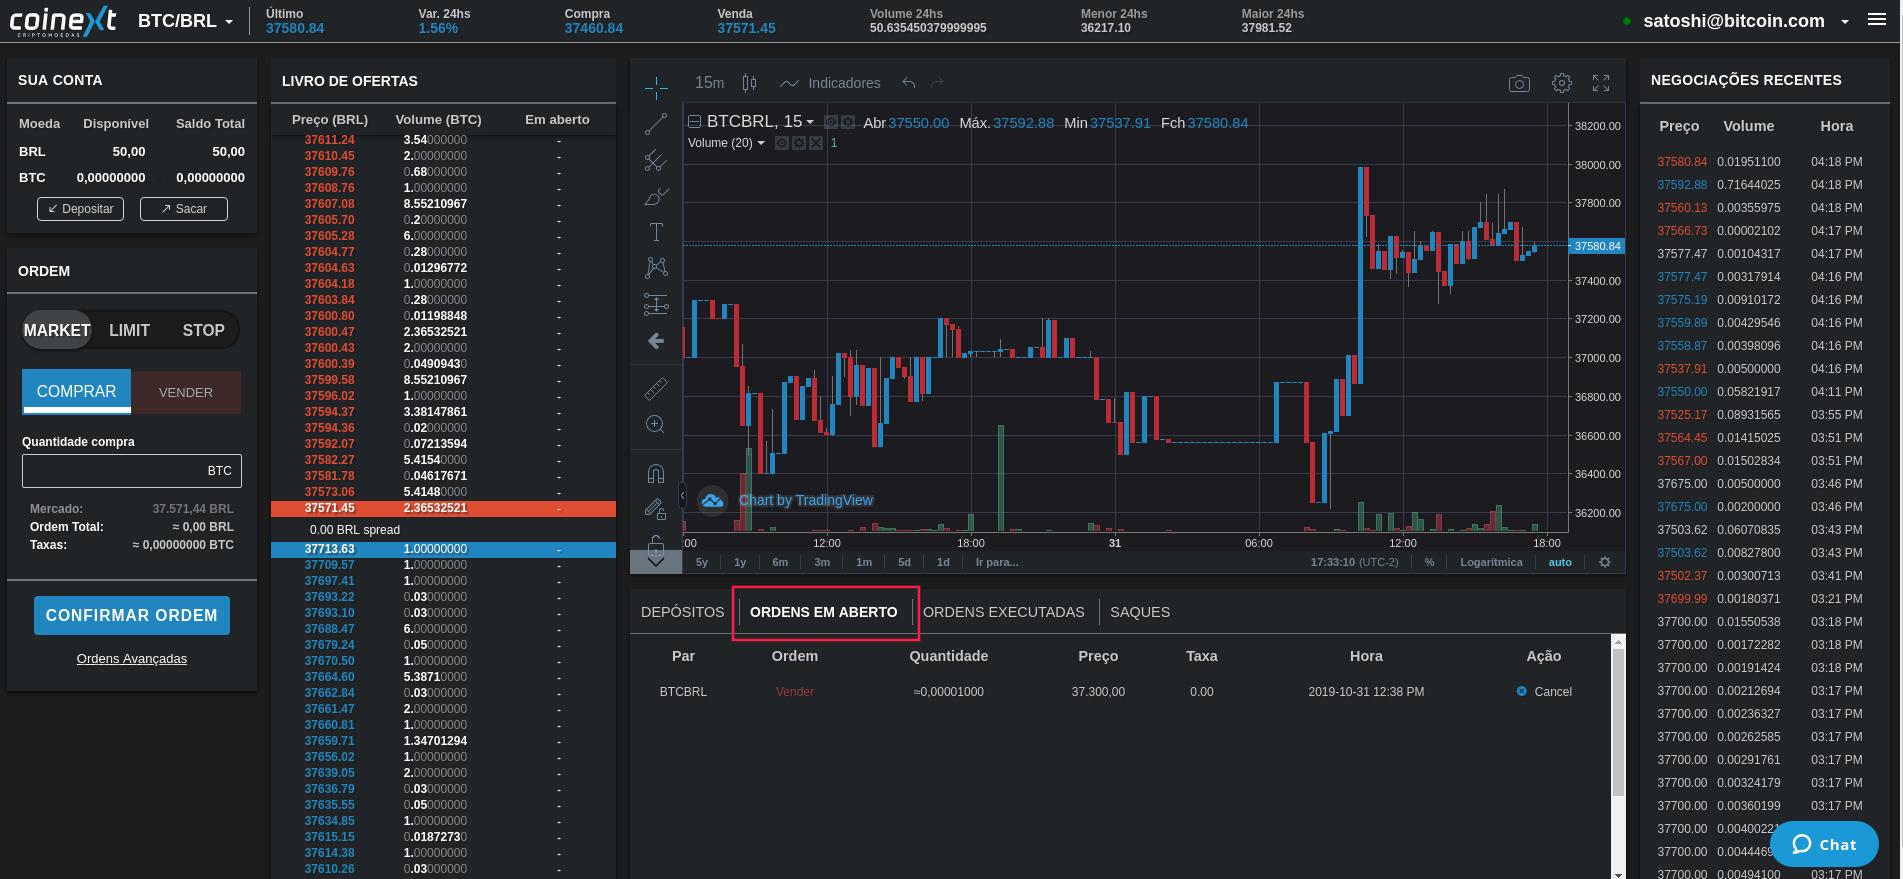 Interface plataforma Coinext - ordens em aberto